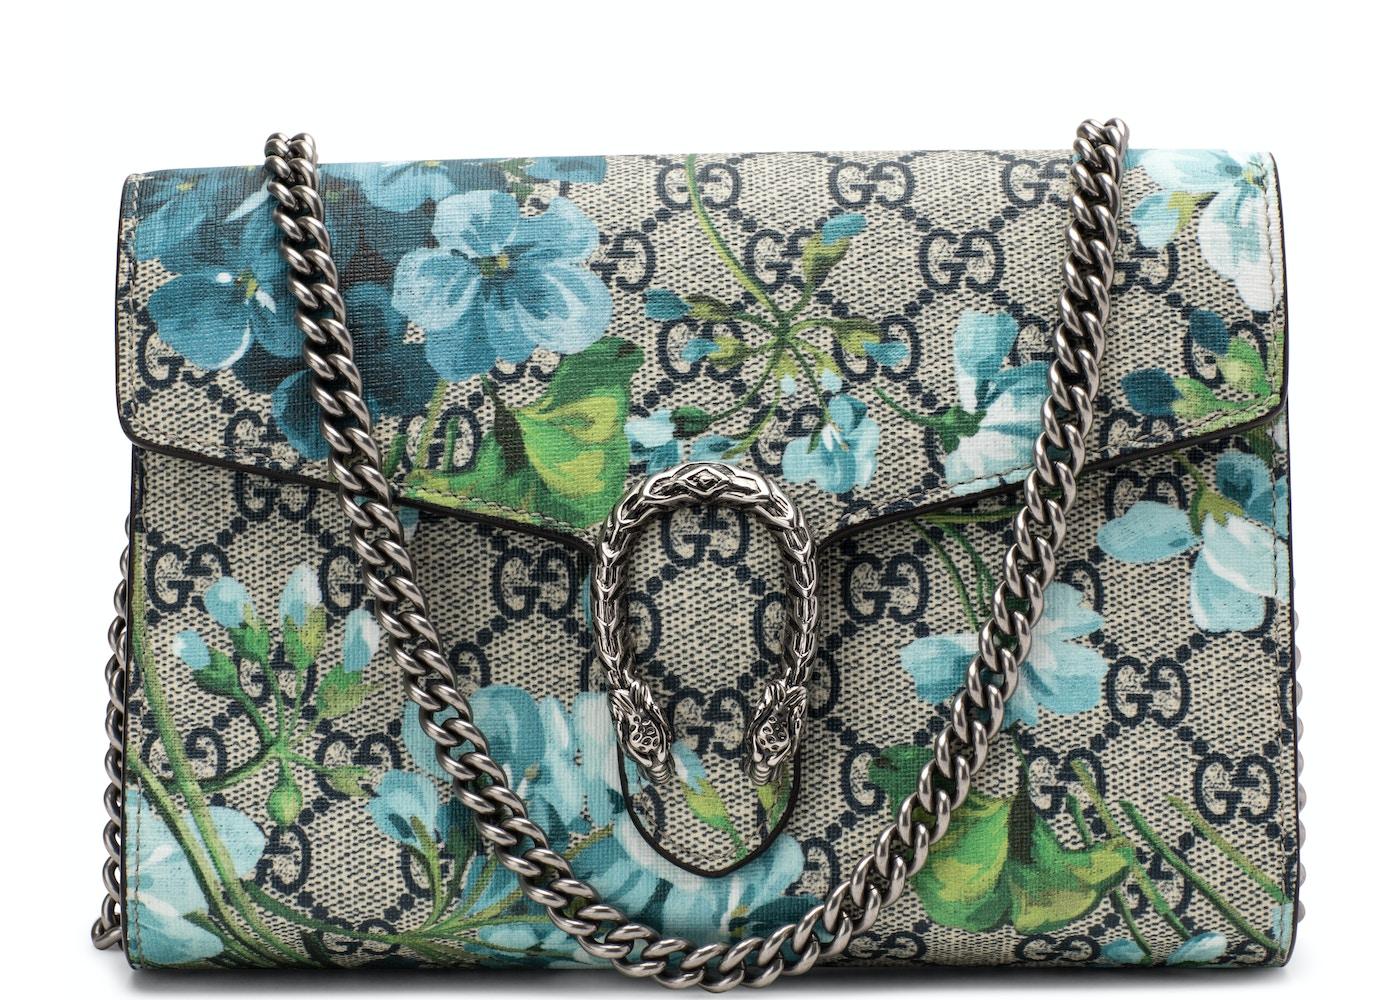 89d43bb412e Gucci Dionysus Crossbody GG Supreme Monogram Blooms Mini ...